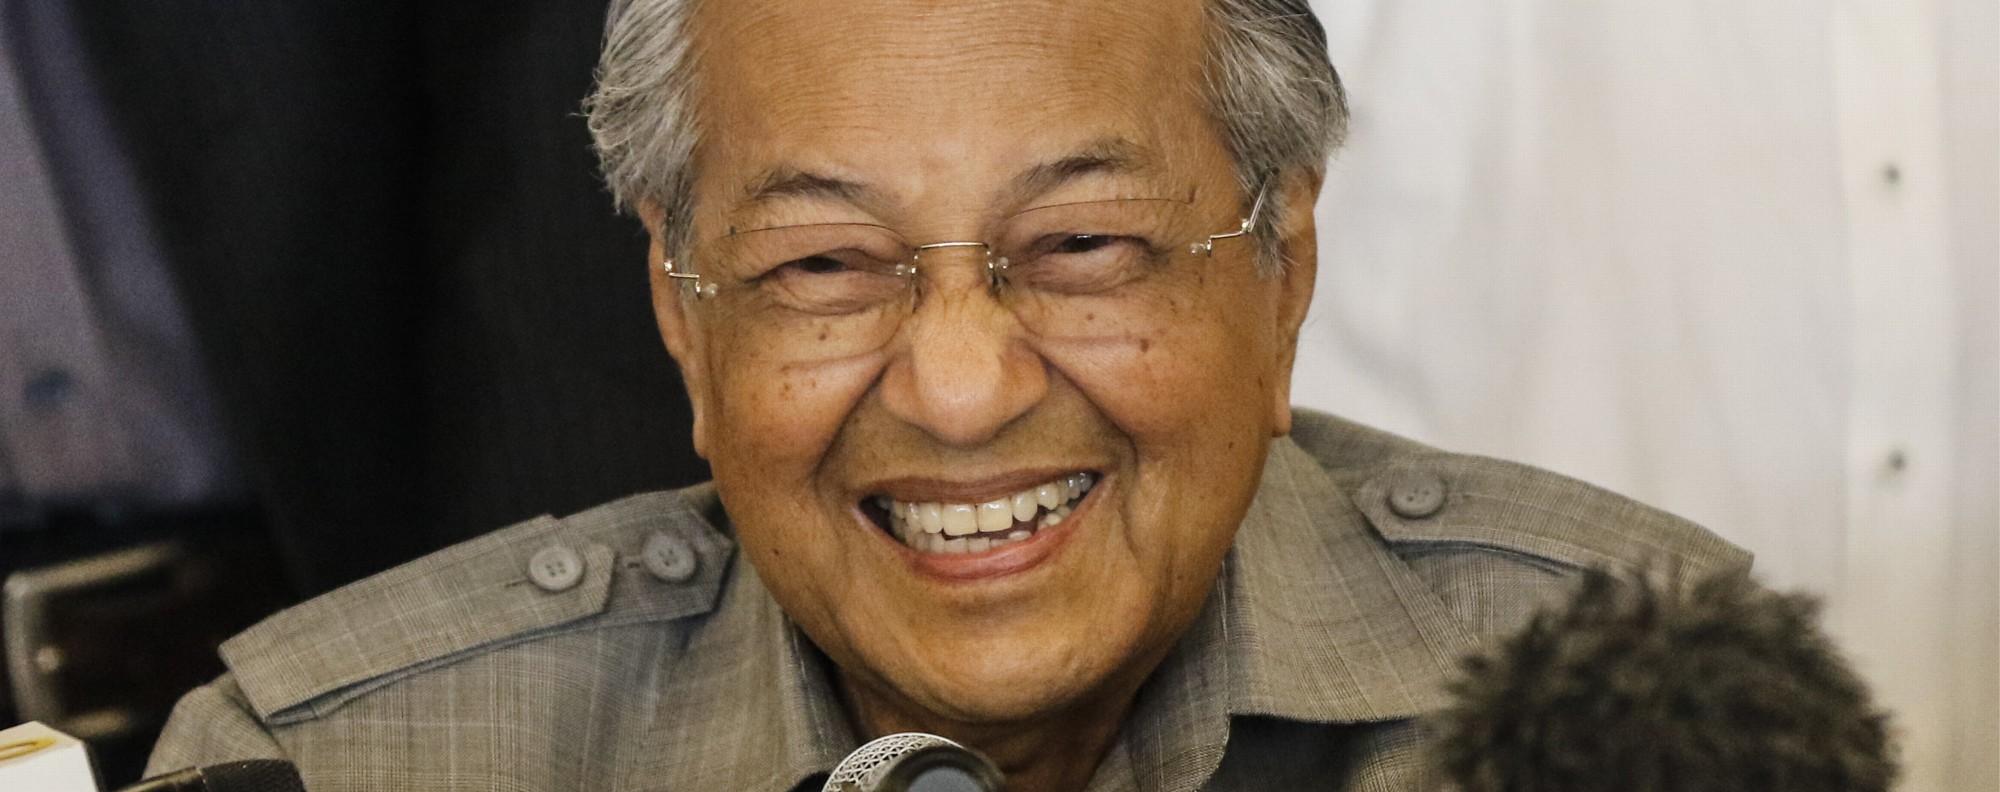 Mahathir Mohamad. Photo: EPA-EFE